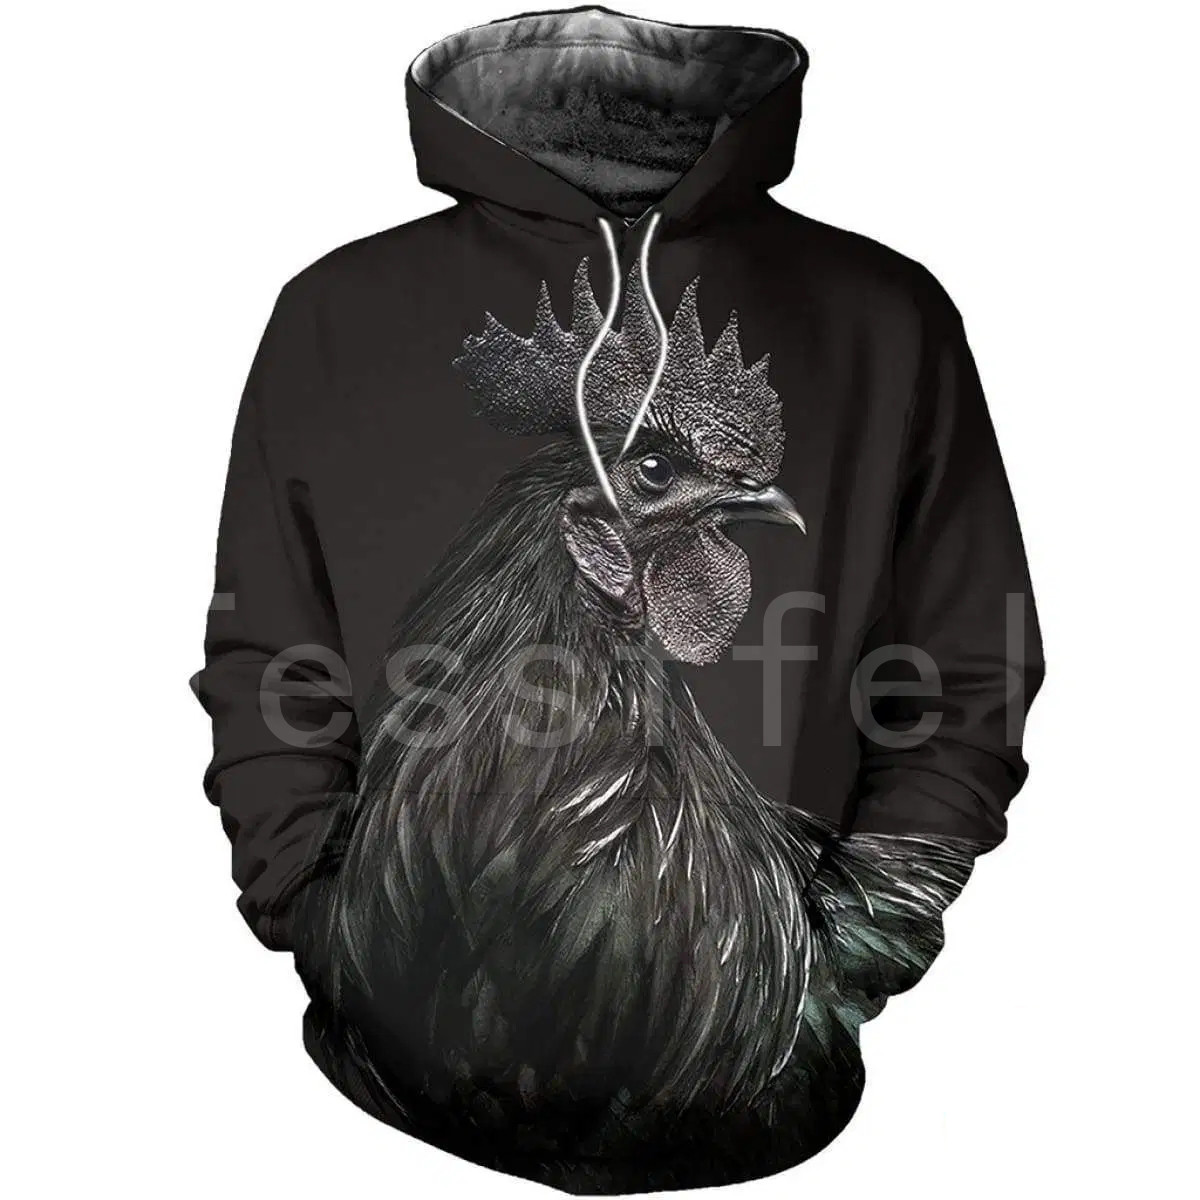 Tessffel Animal Symbol Chicken Rooster Funny Crewneck NewFashion Tracksuit Harajuku 3DPrint Zipper/Hoodies/Sweatshirts/Jacket C8